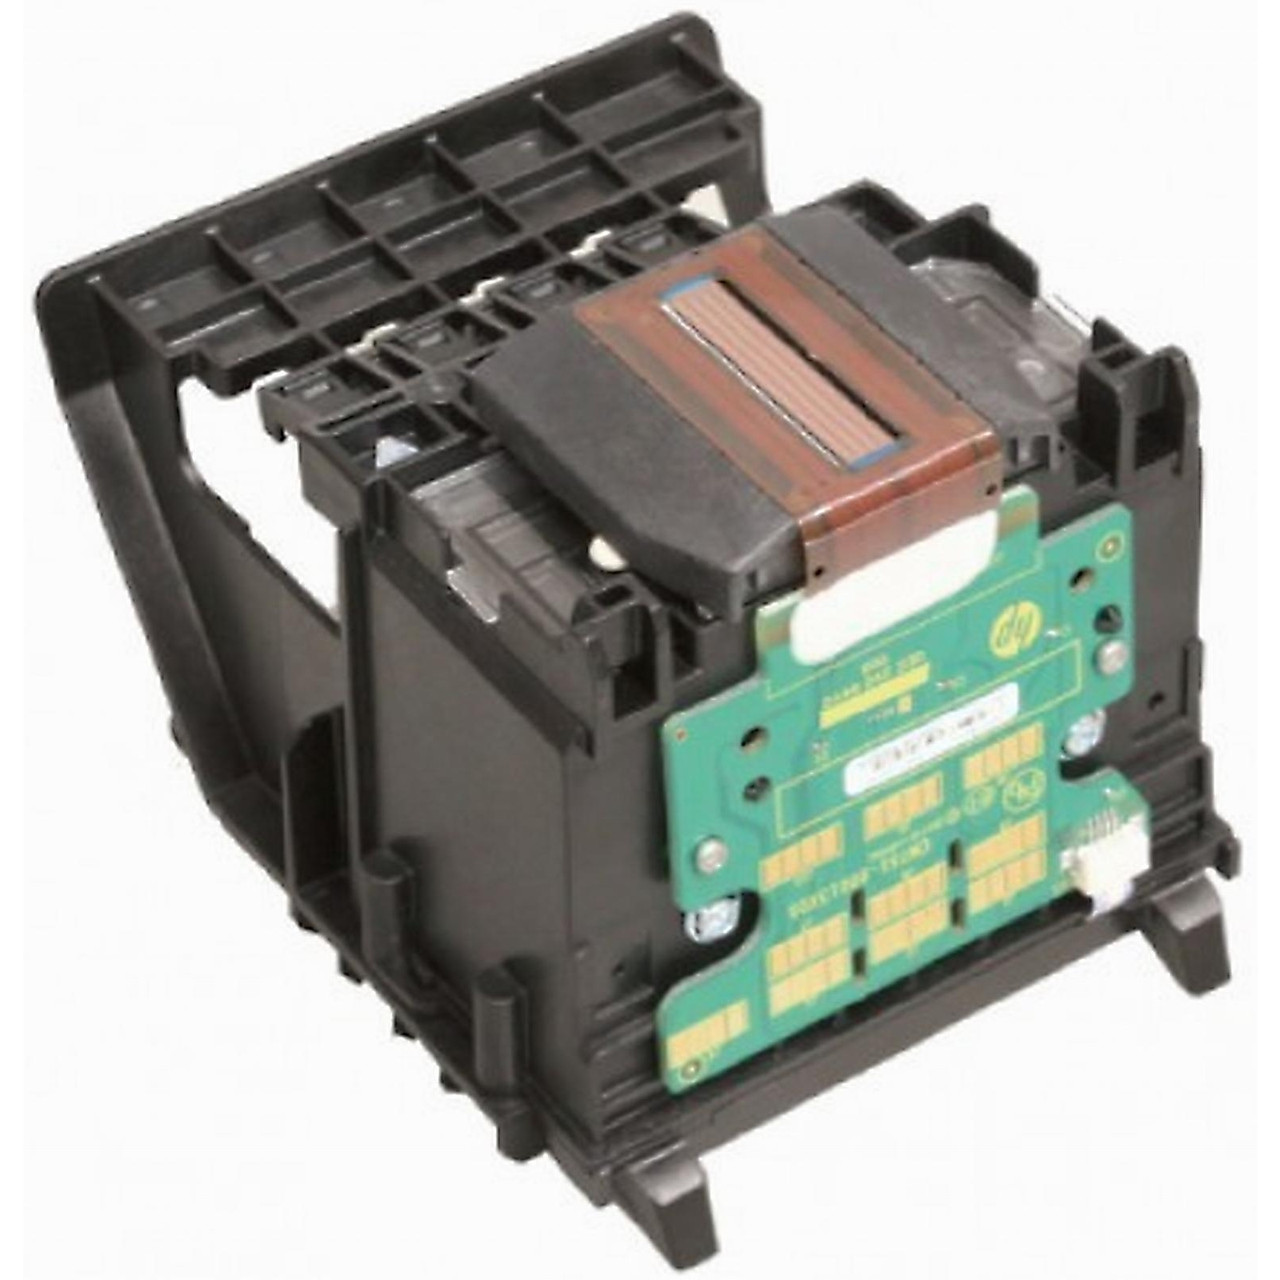 Восстановленная печатающая головка HP №711 Printhead для HP DesignJet T120/T125/T130/T520/T525/T530